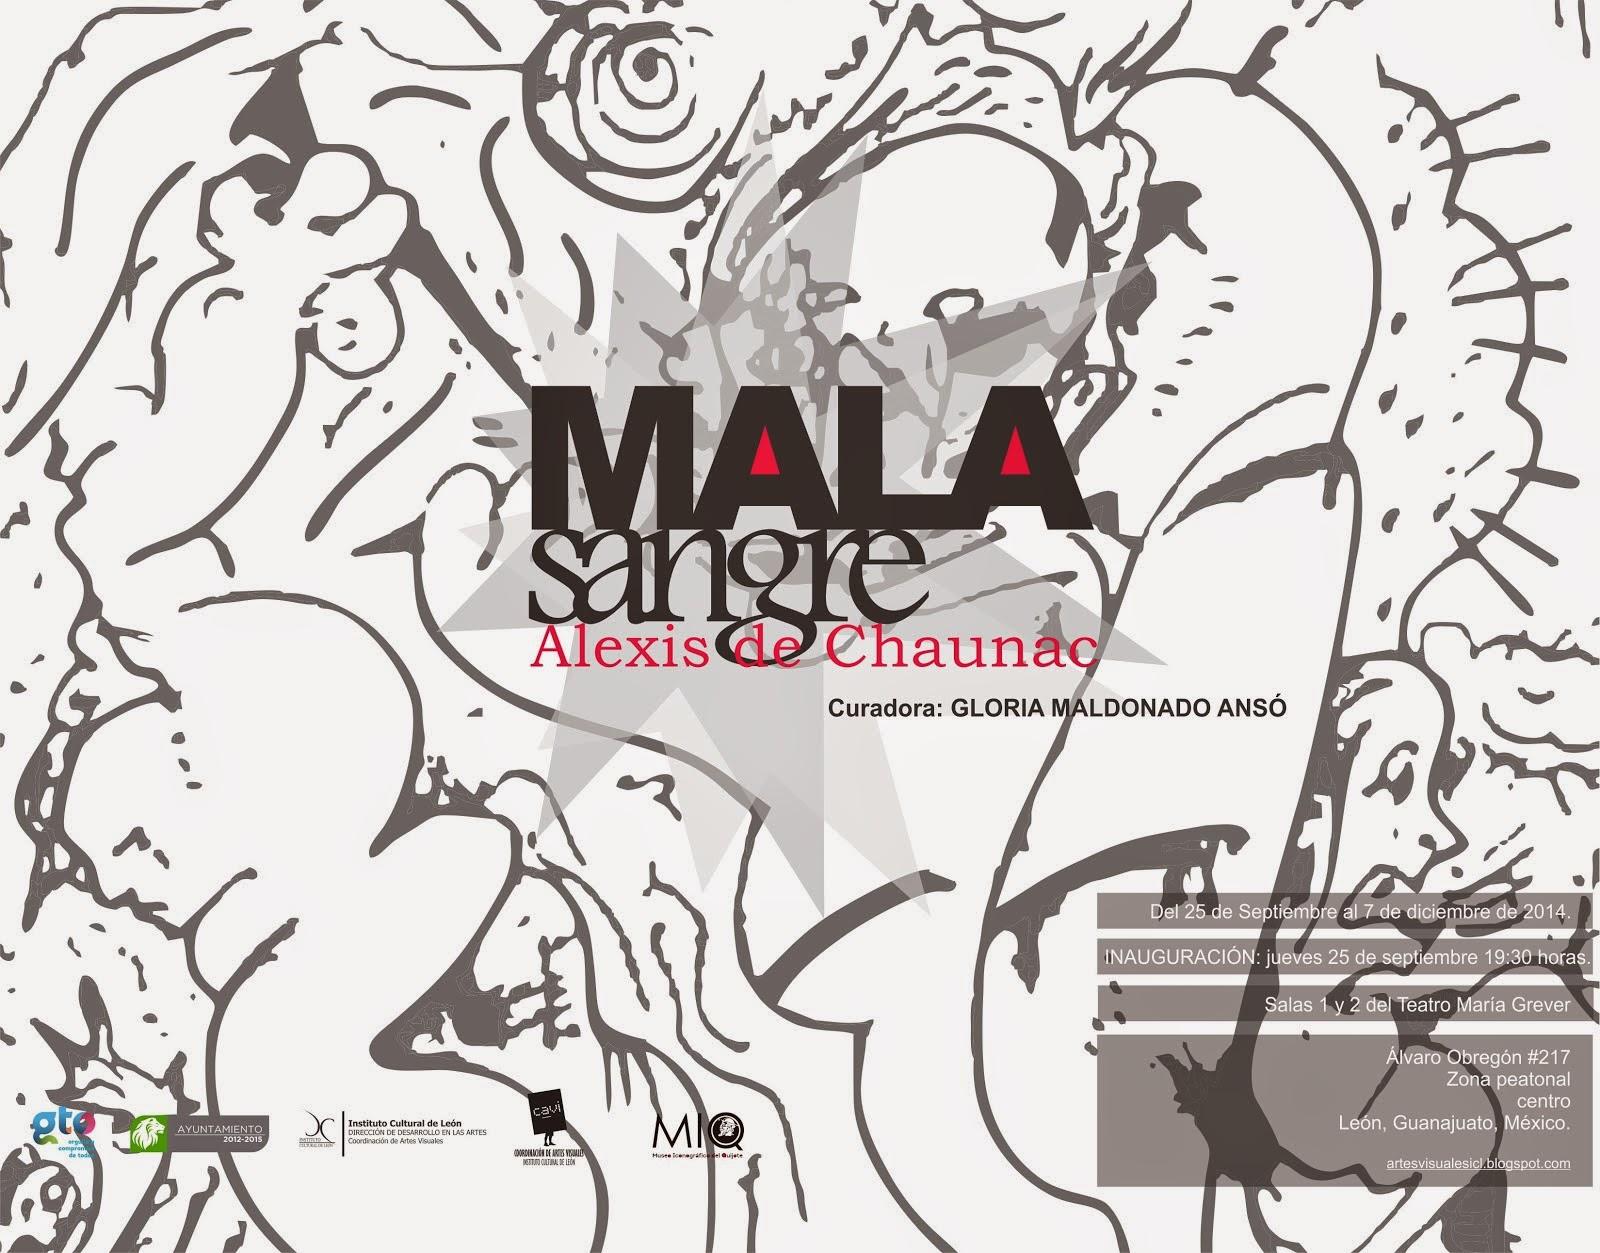 MALA SANGRE, Alexis de Chanuac